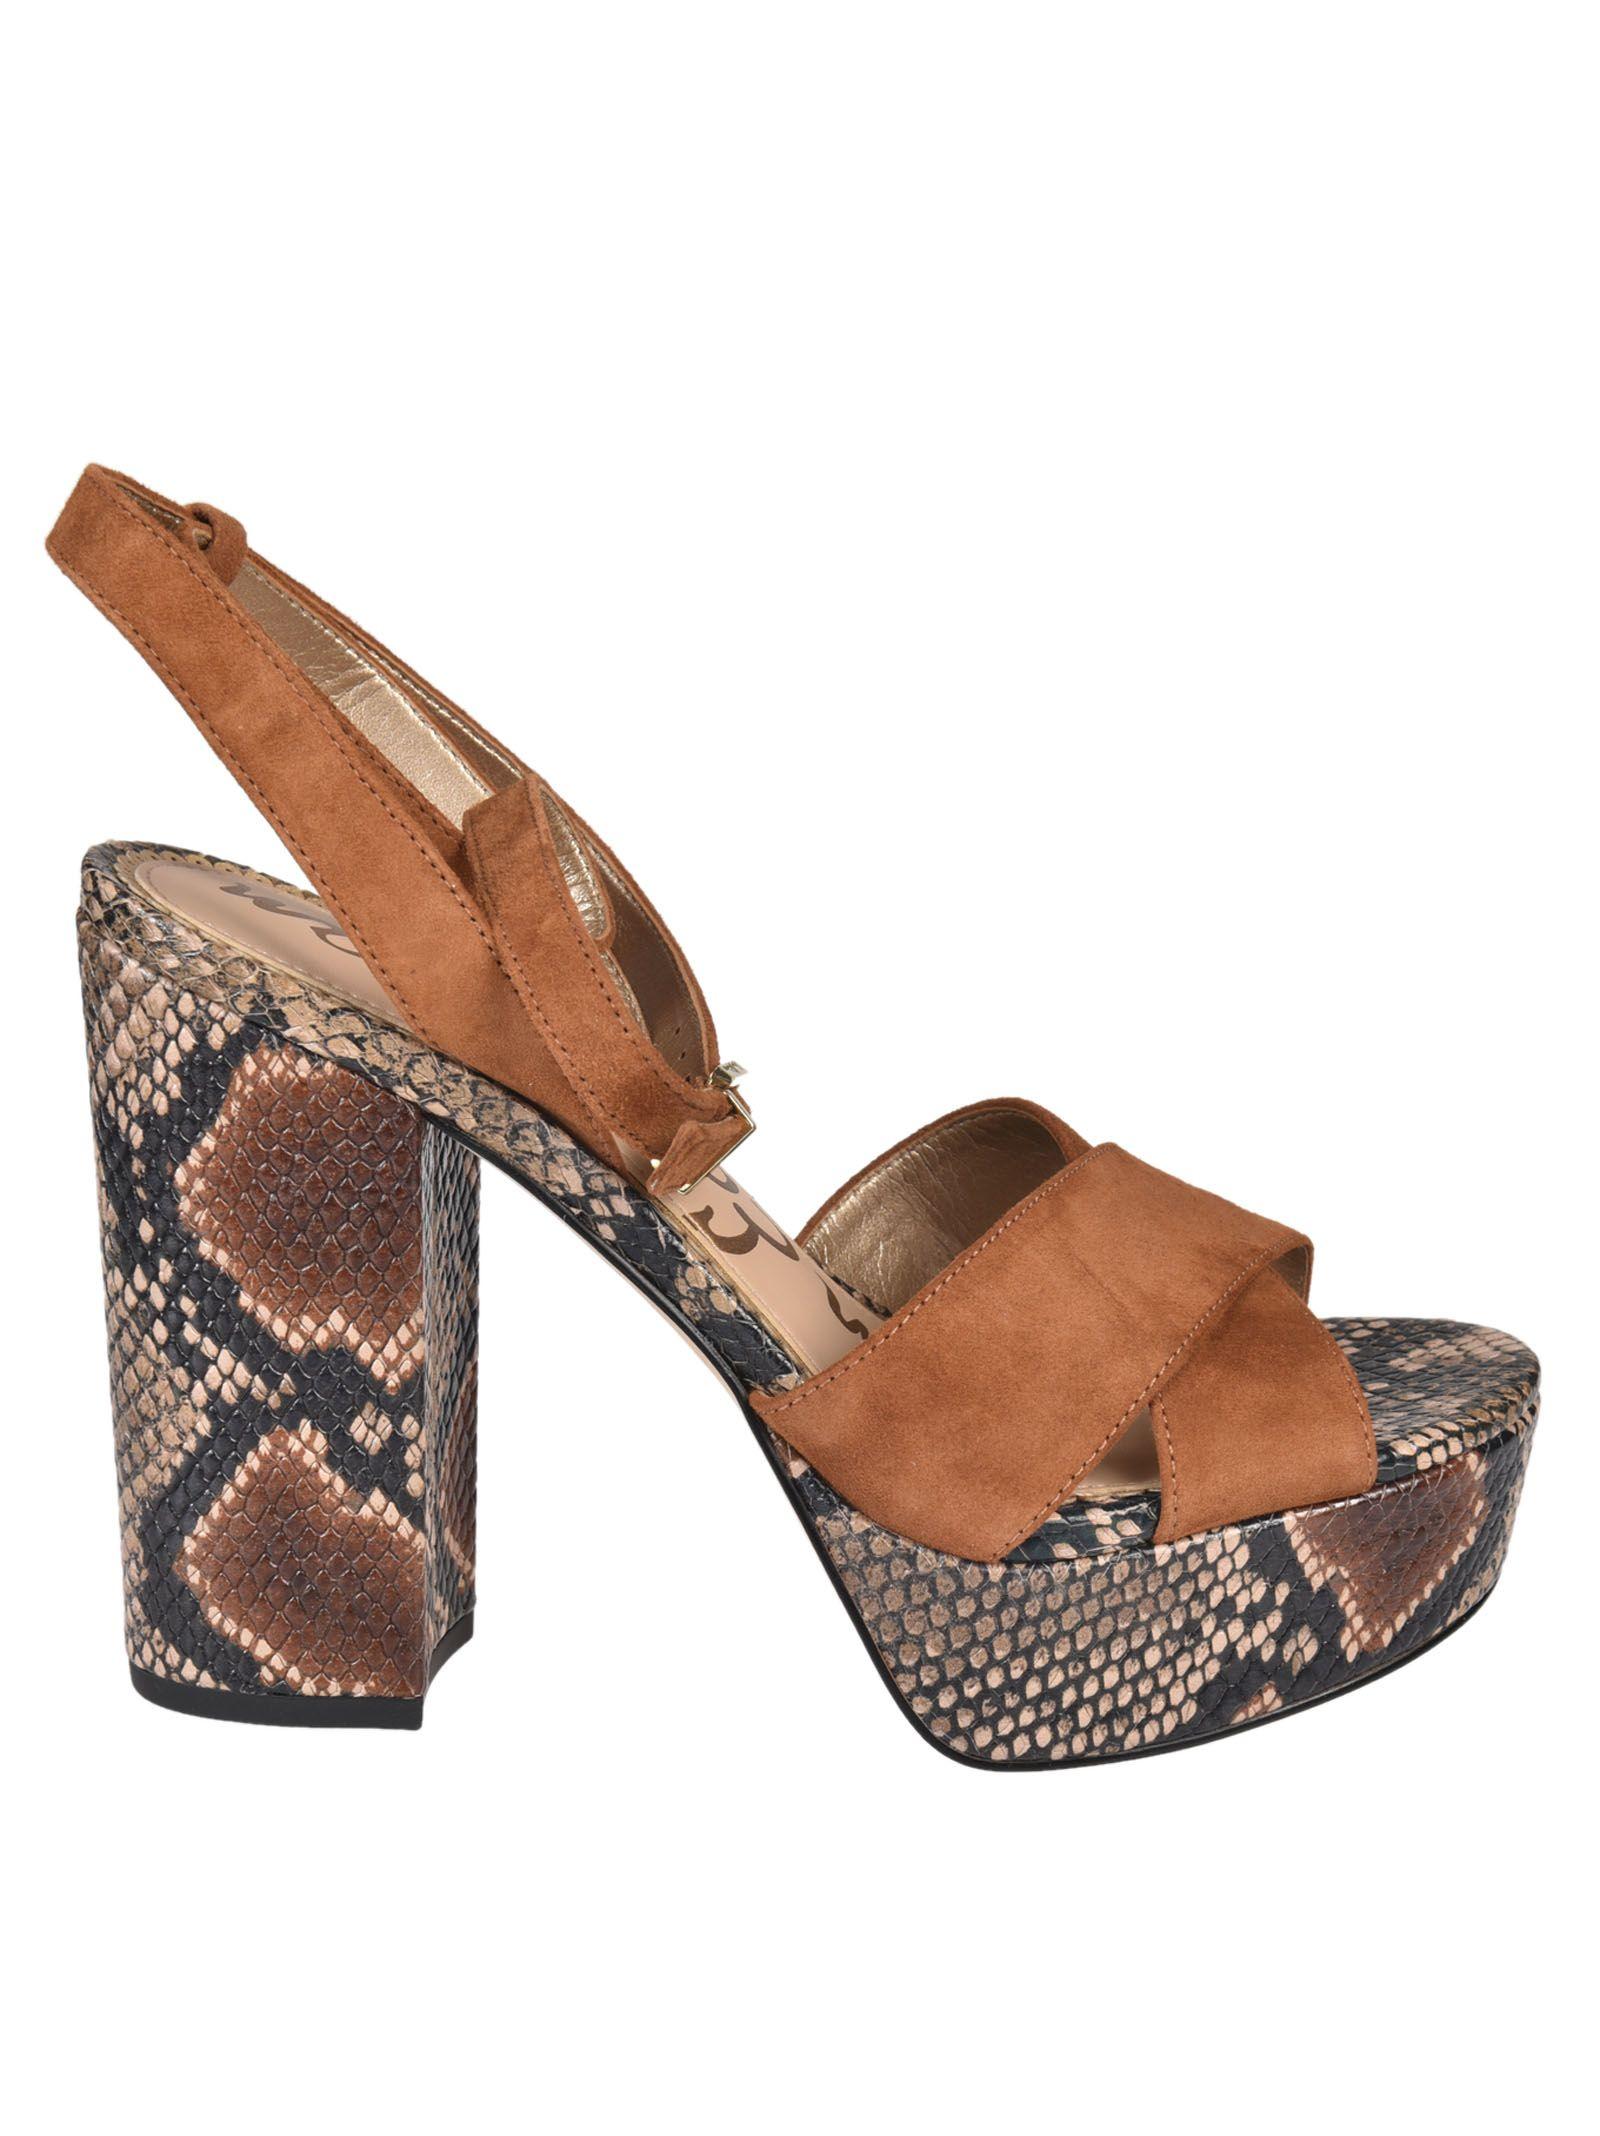 Sam Edelman Mara Sandals